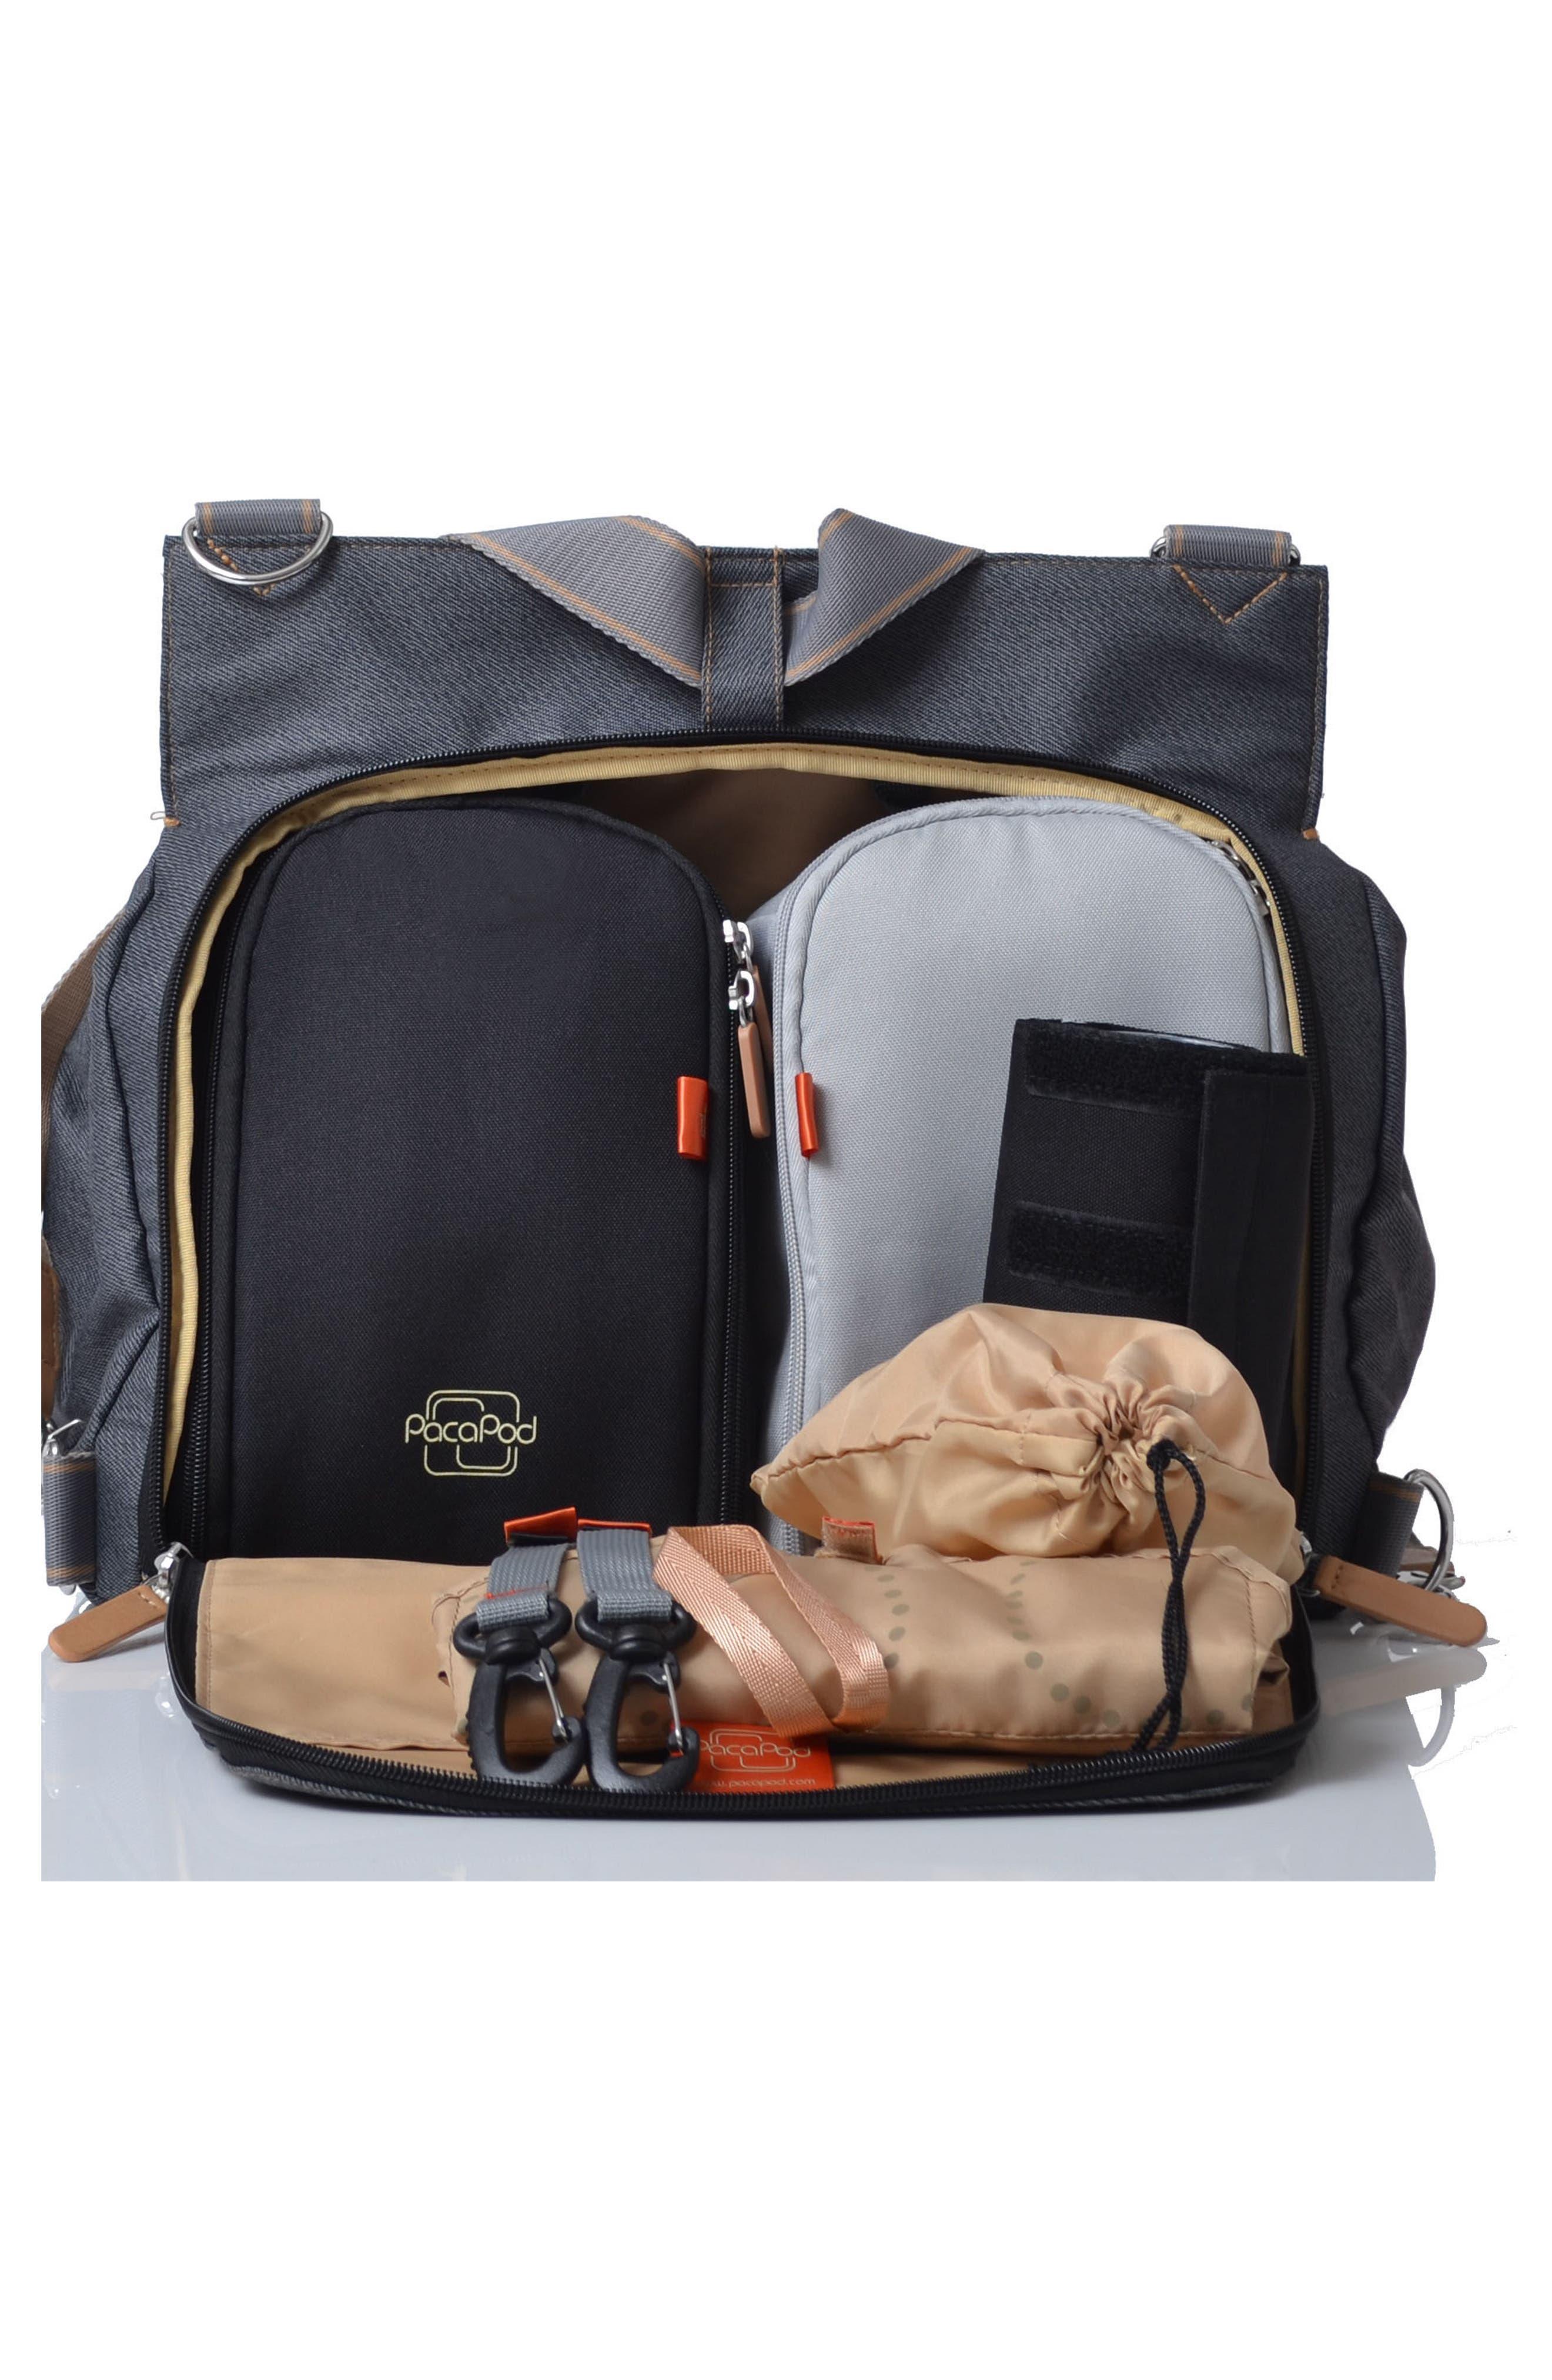 'Oban' Diaper Bag,                             Alternate thumbnail 3, color,                             BLACK CHARCOAL